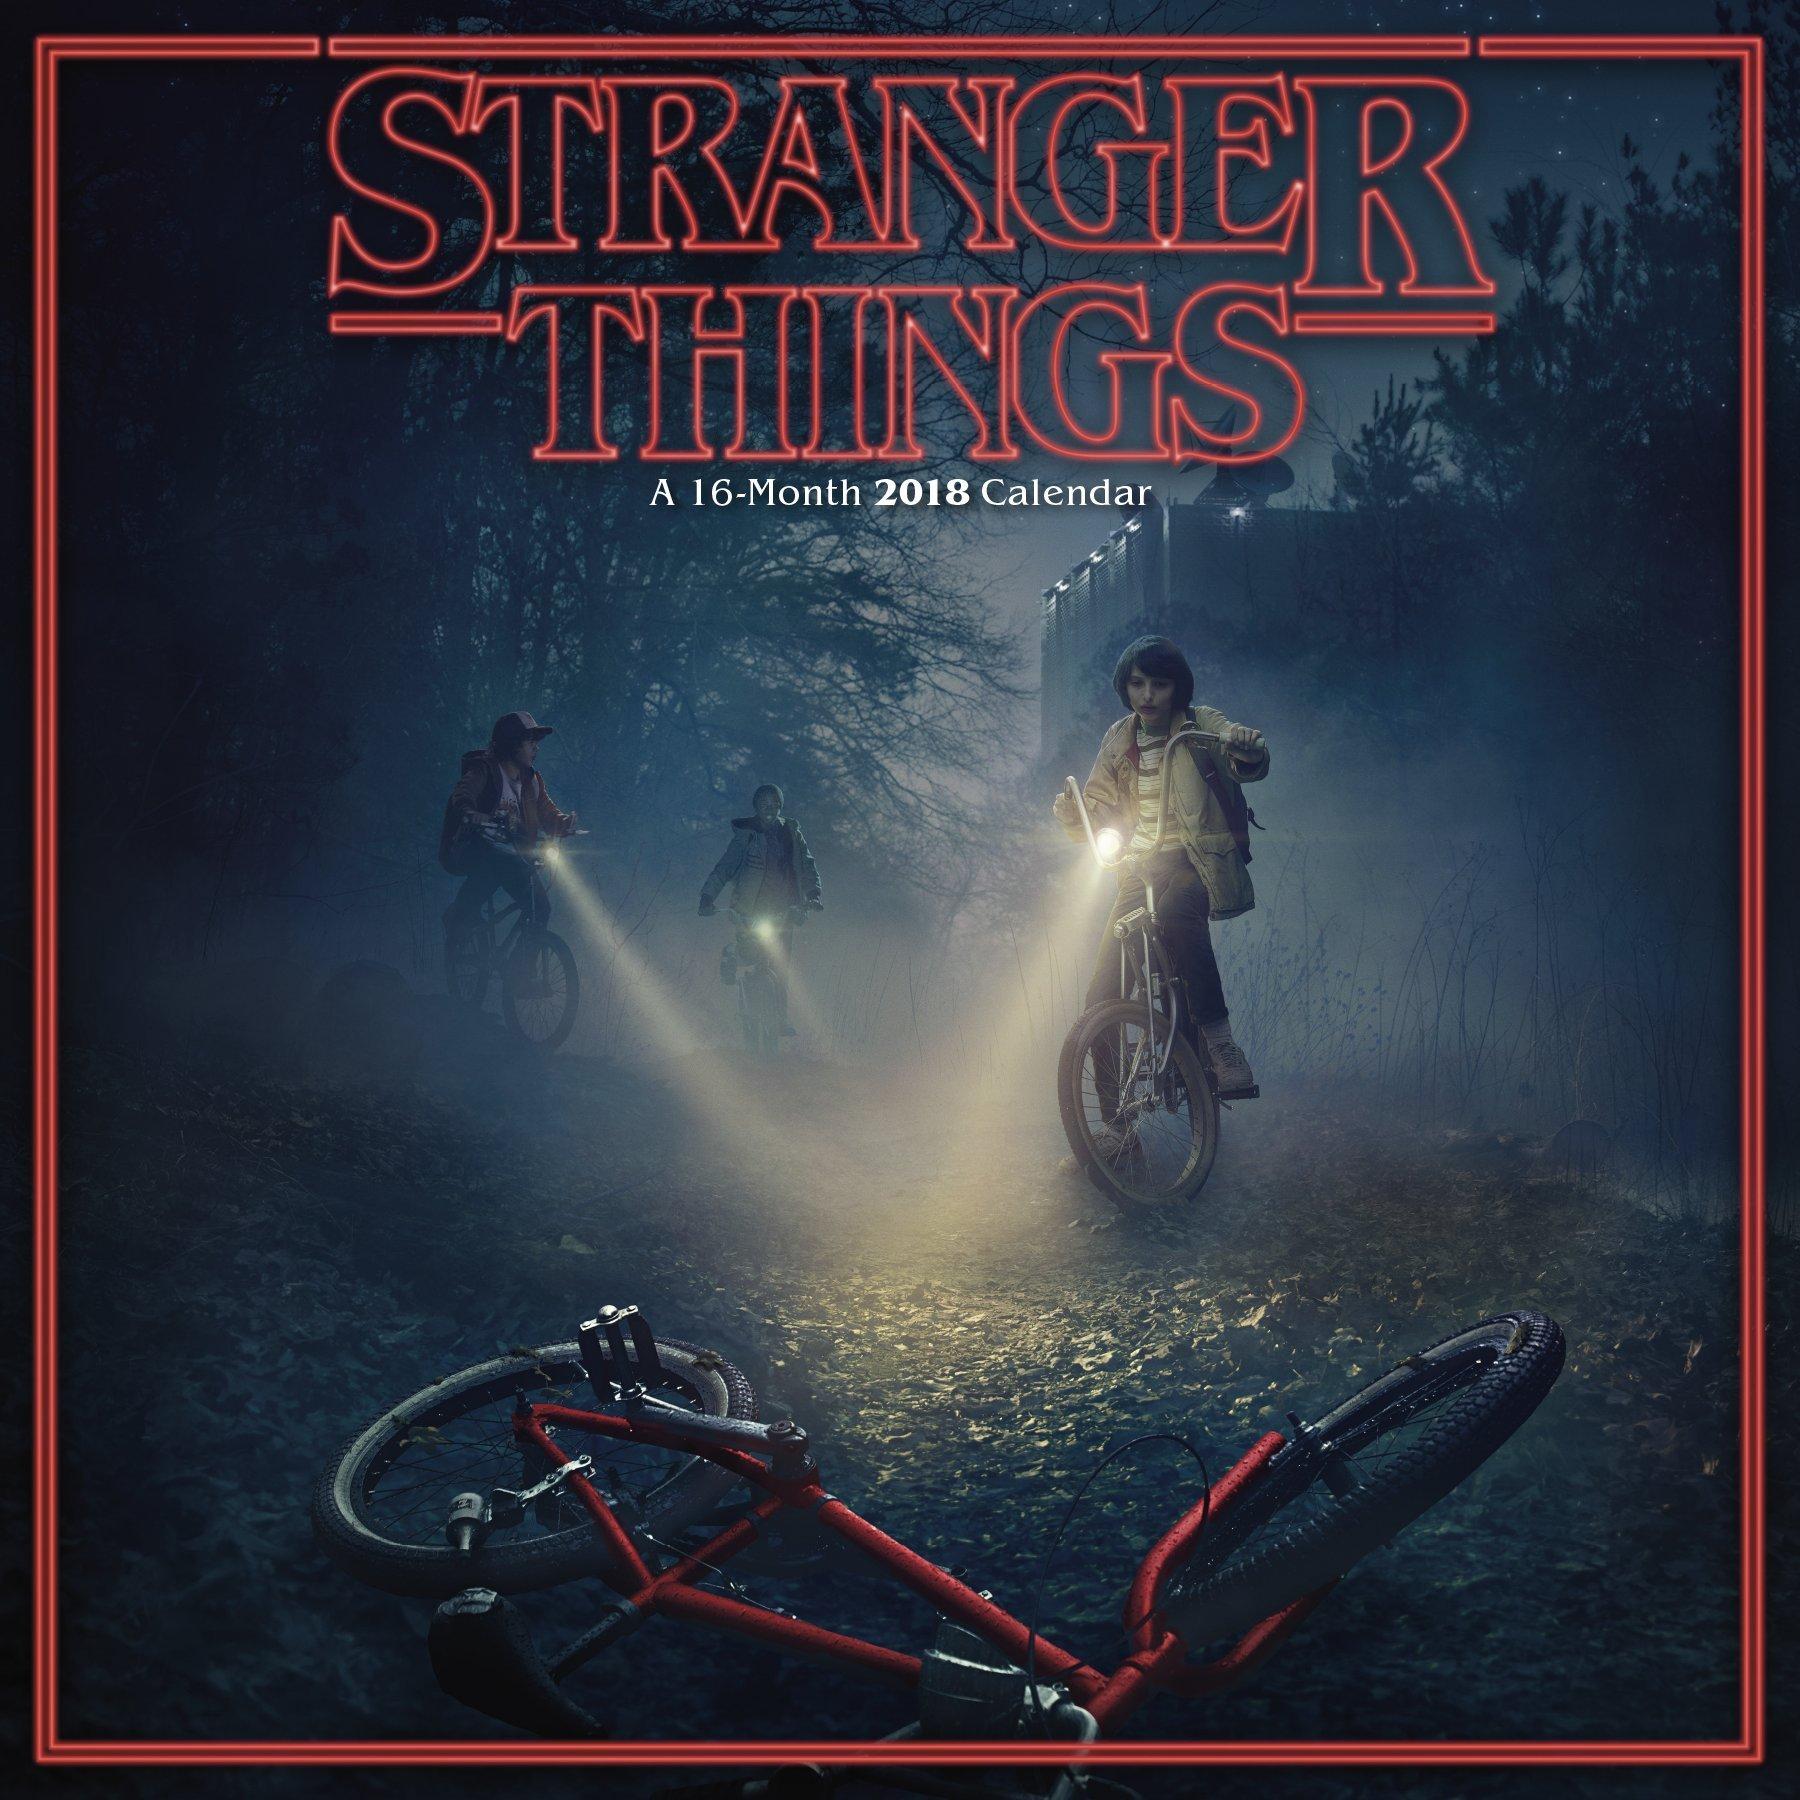 Stranger Things 2018 16-Month Wall Calendar: Trends ...